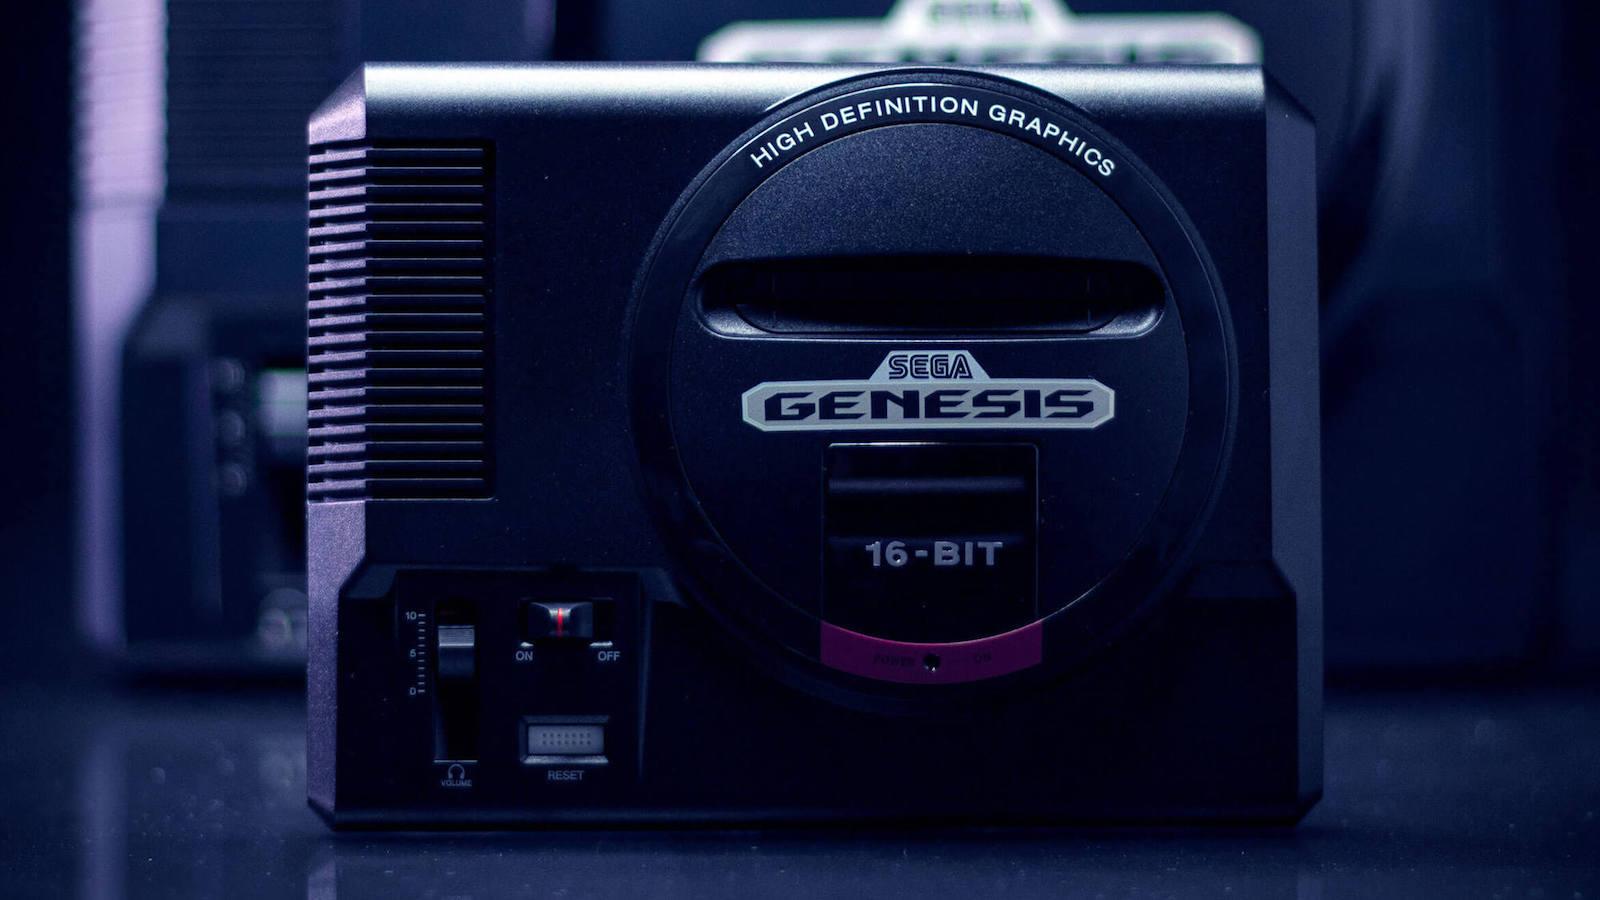 SEGA Genesis Mini Portable Console